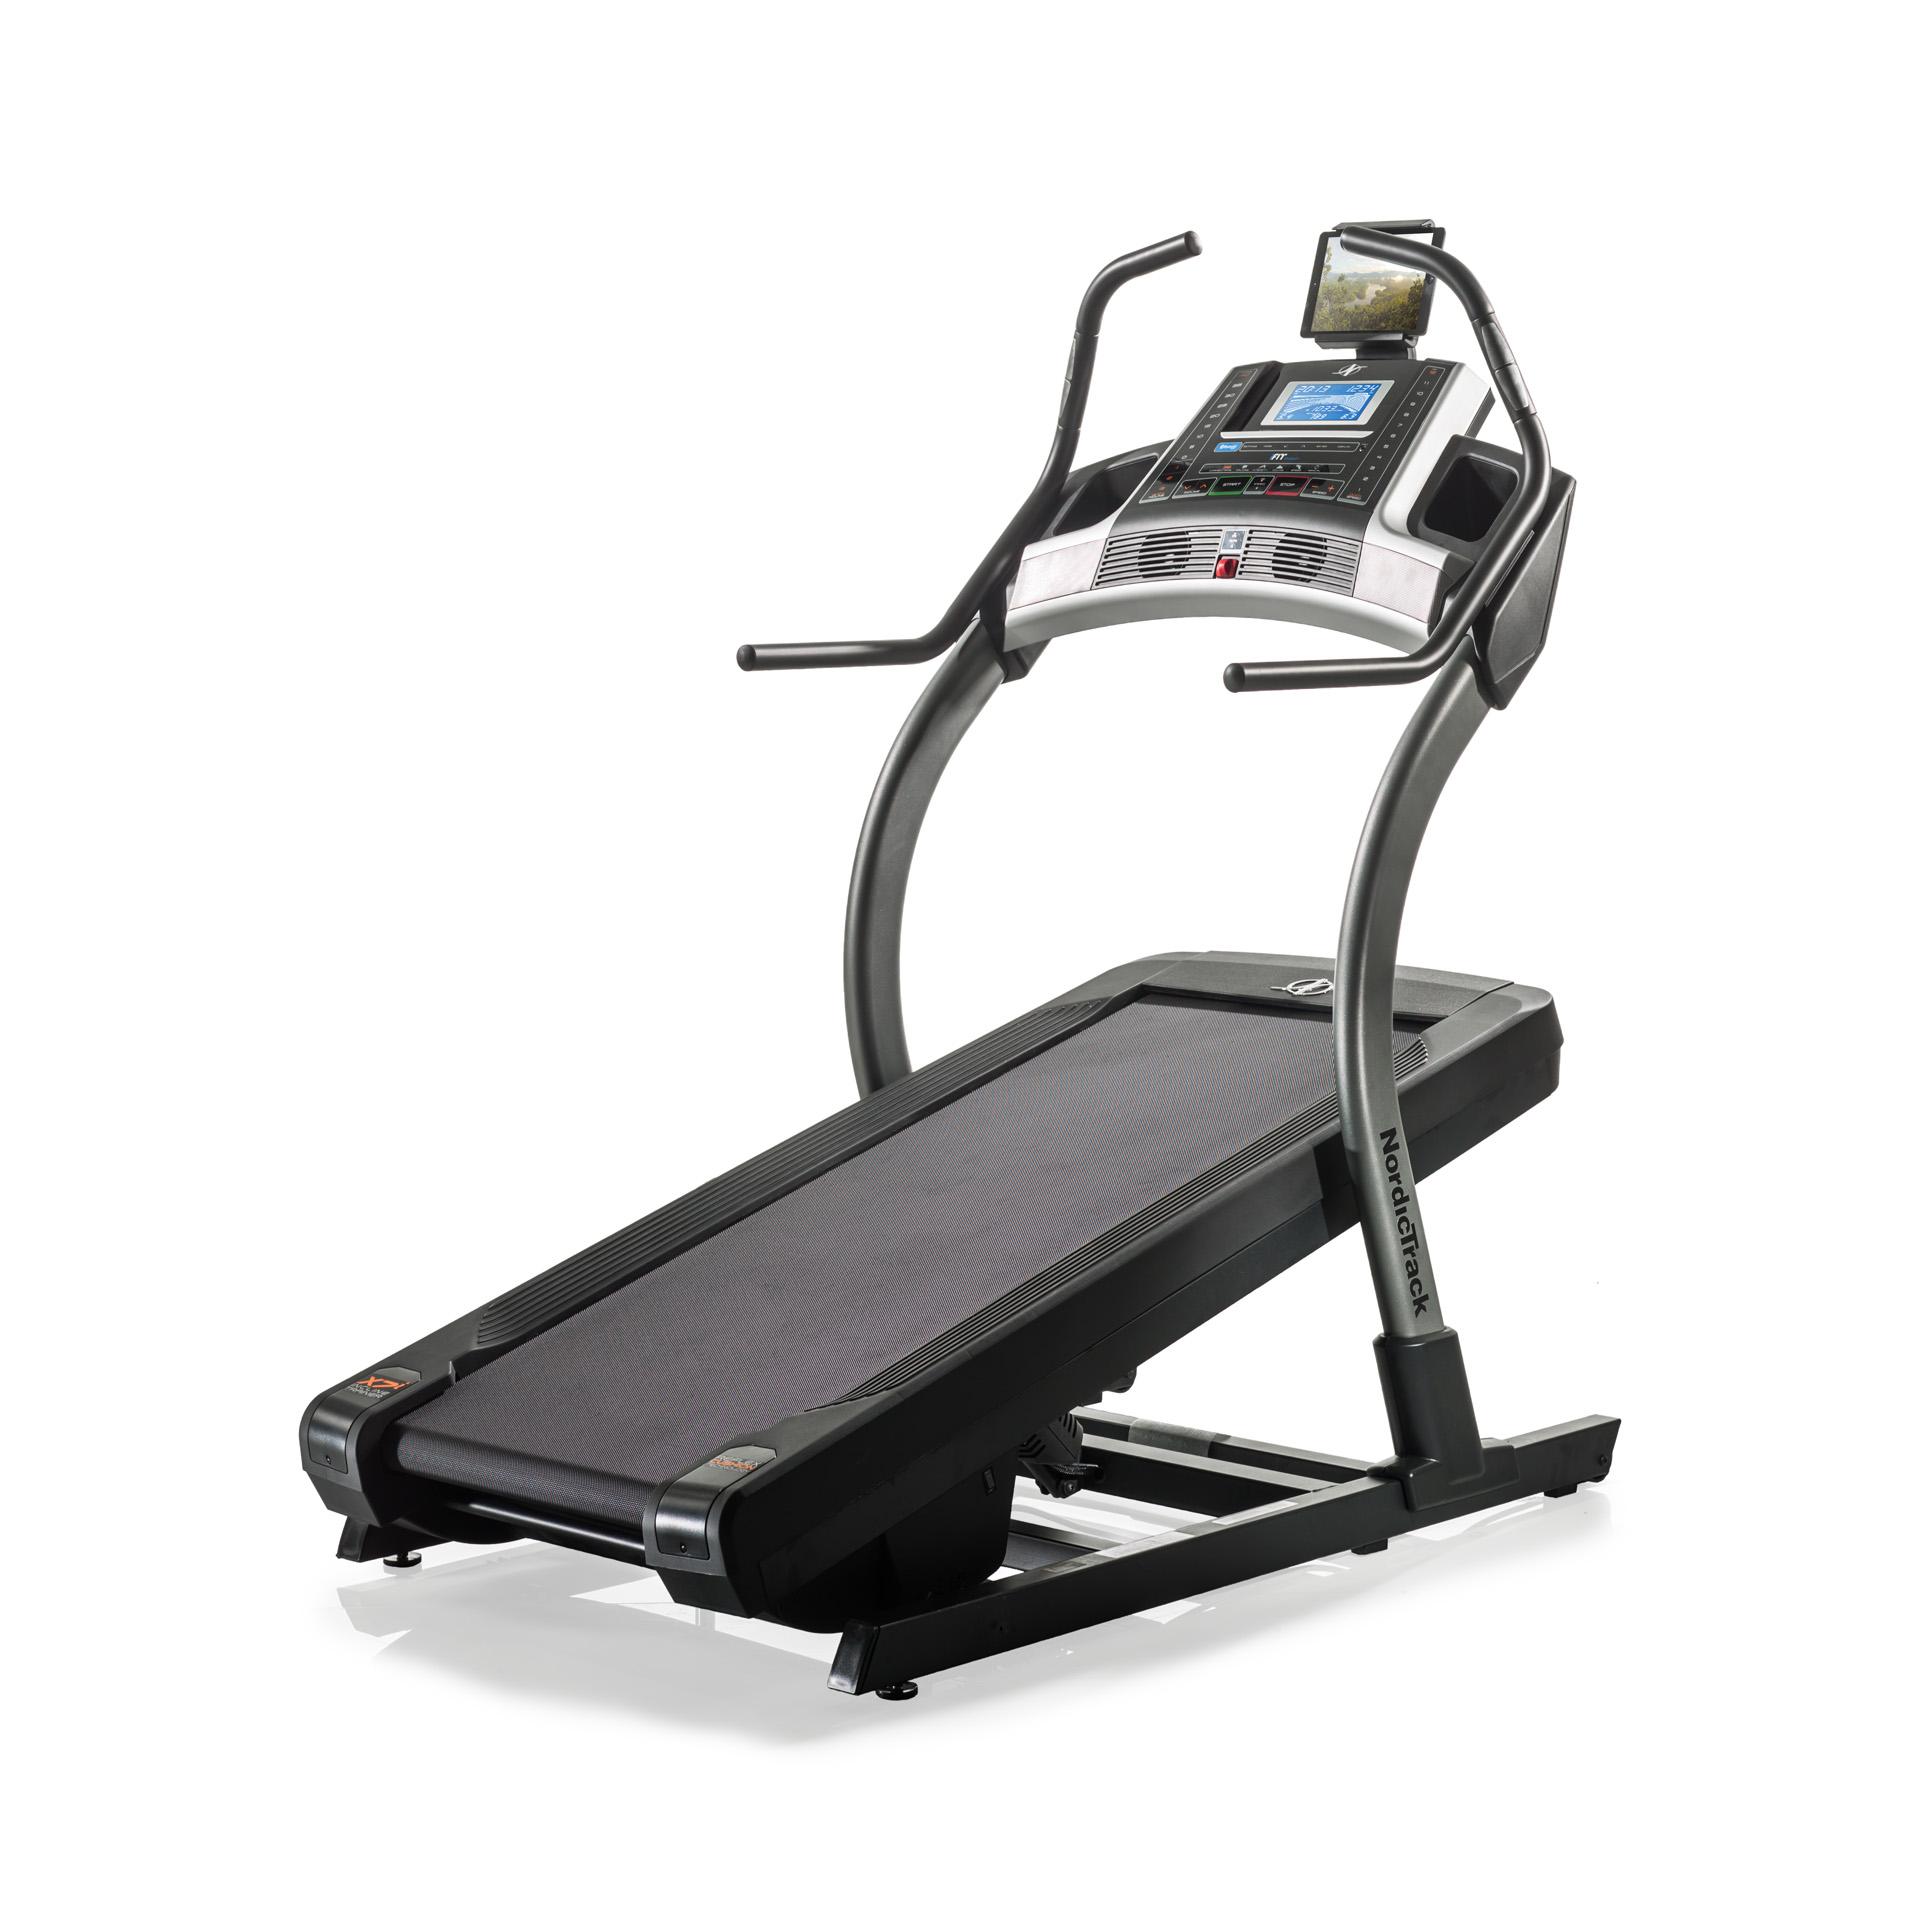 NordicTrack Incline Trainer X7i